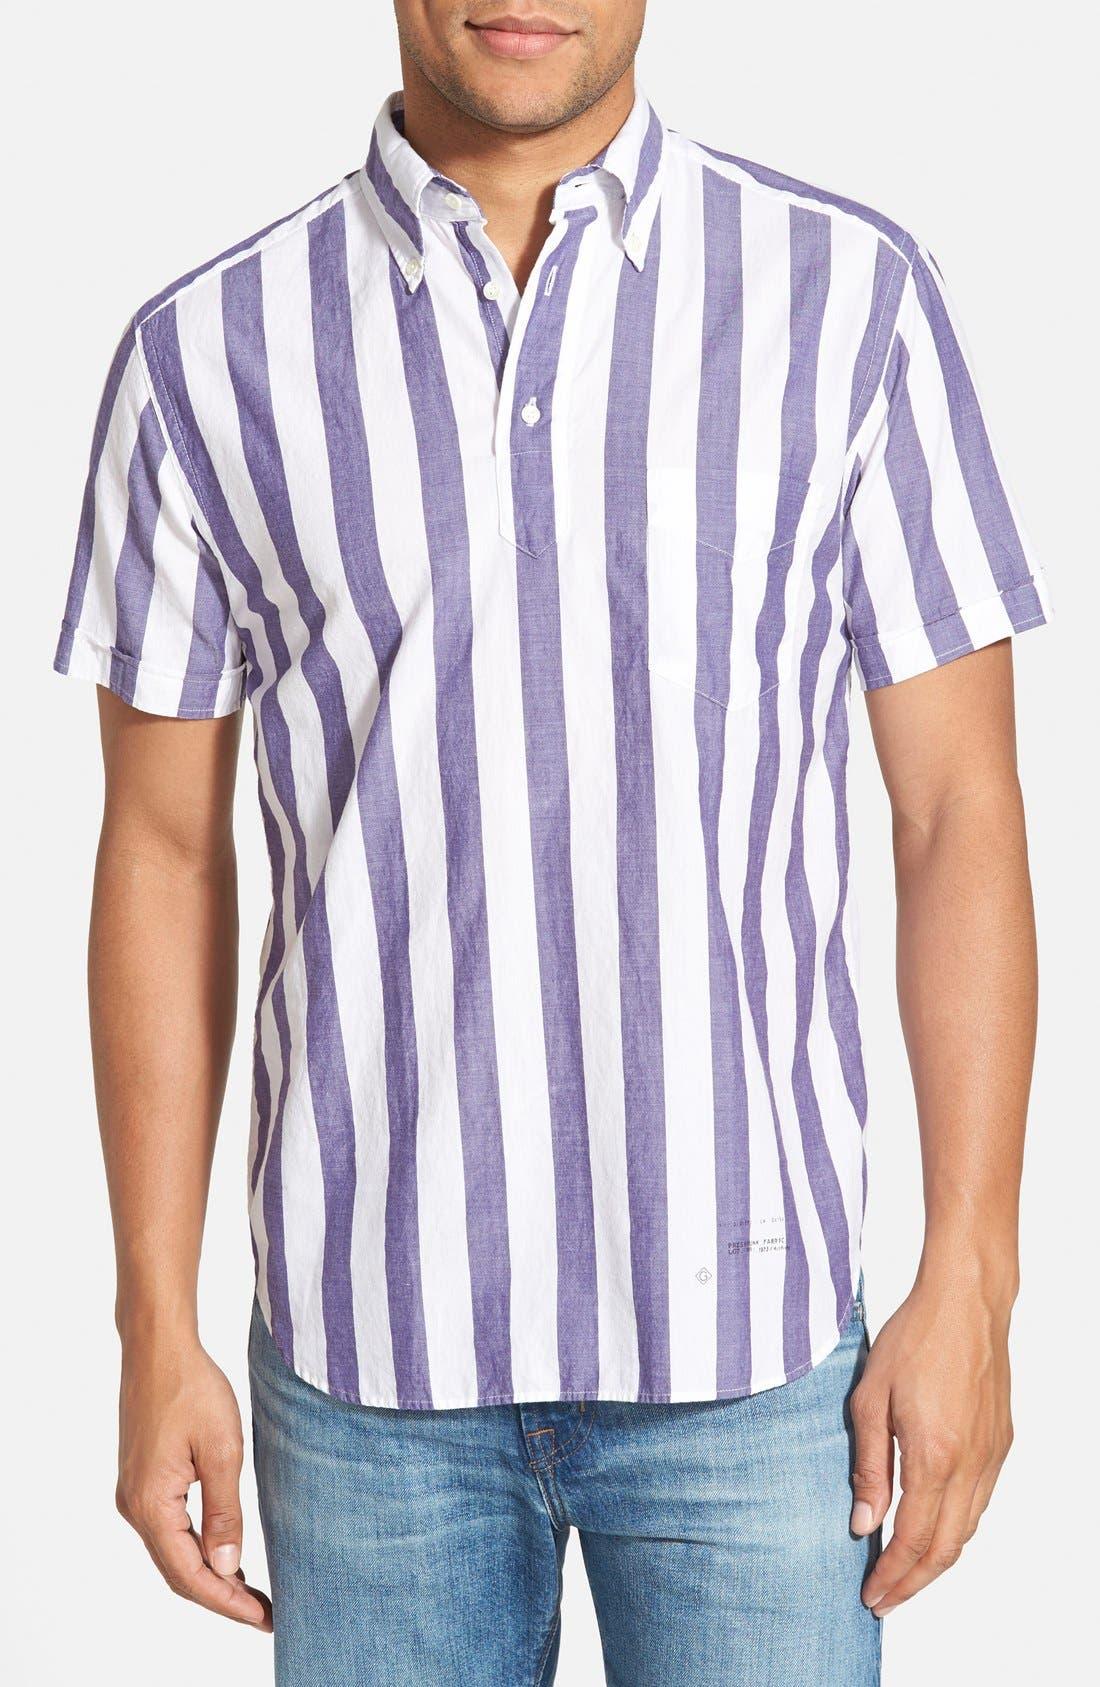 GANT RUGGER E-Z Fit Madras Stripe Woven Pullover Shirt, Main, color, 436